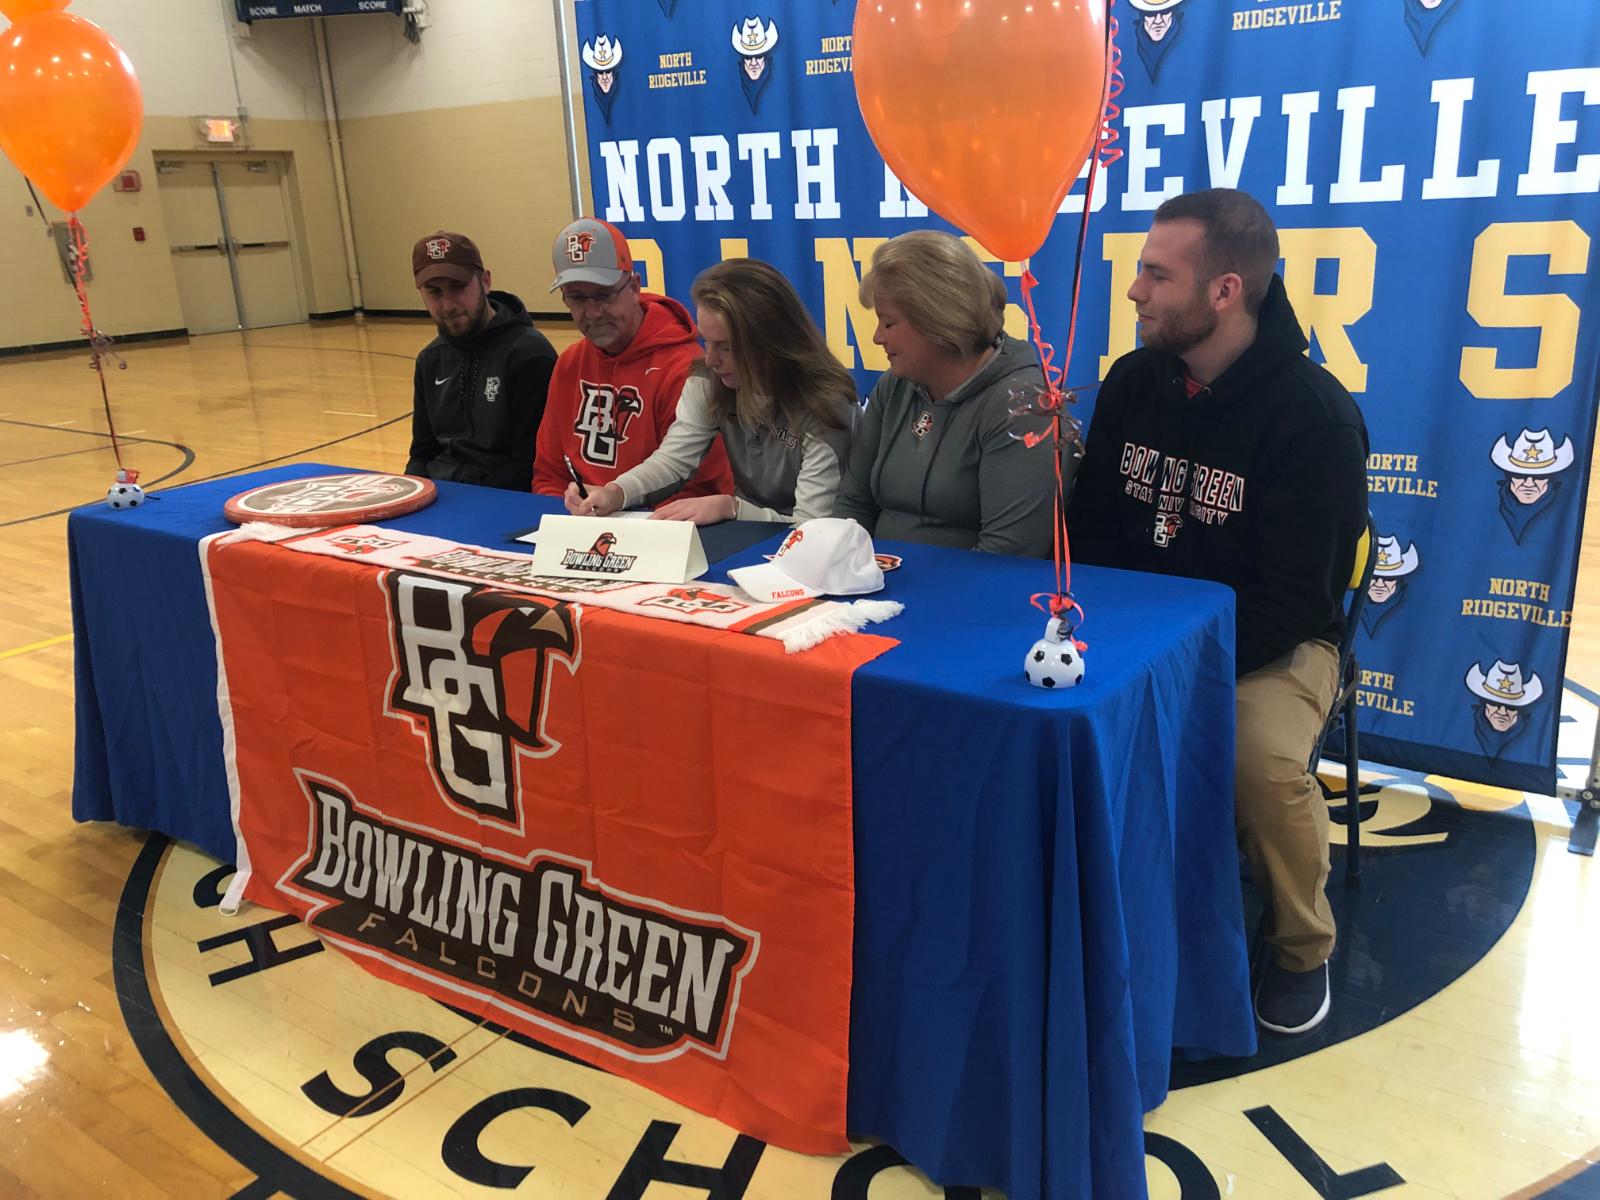 Lauren Milner Signs NLI for Bowling Green State University